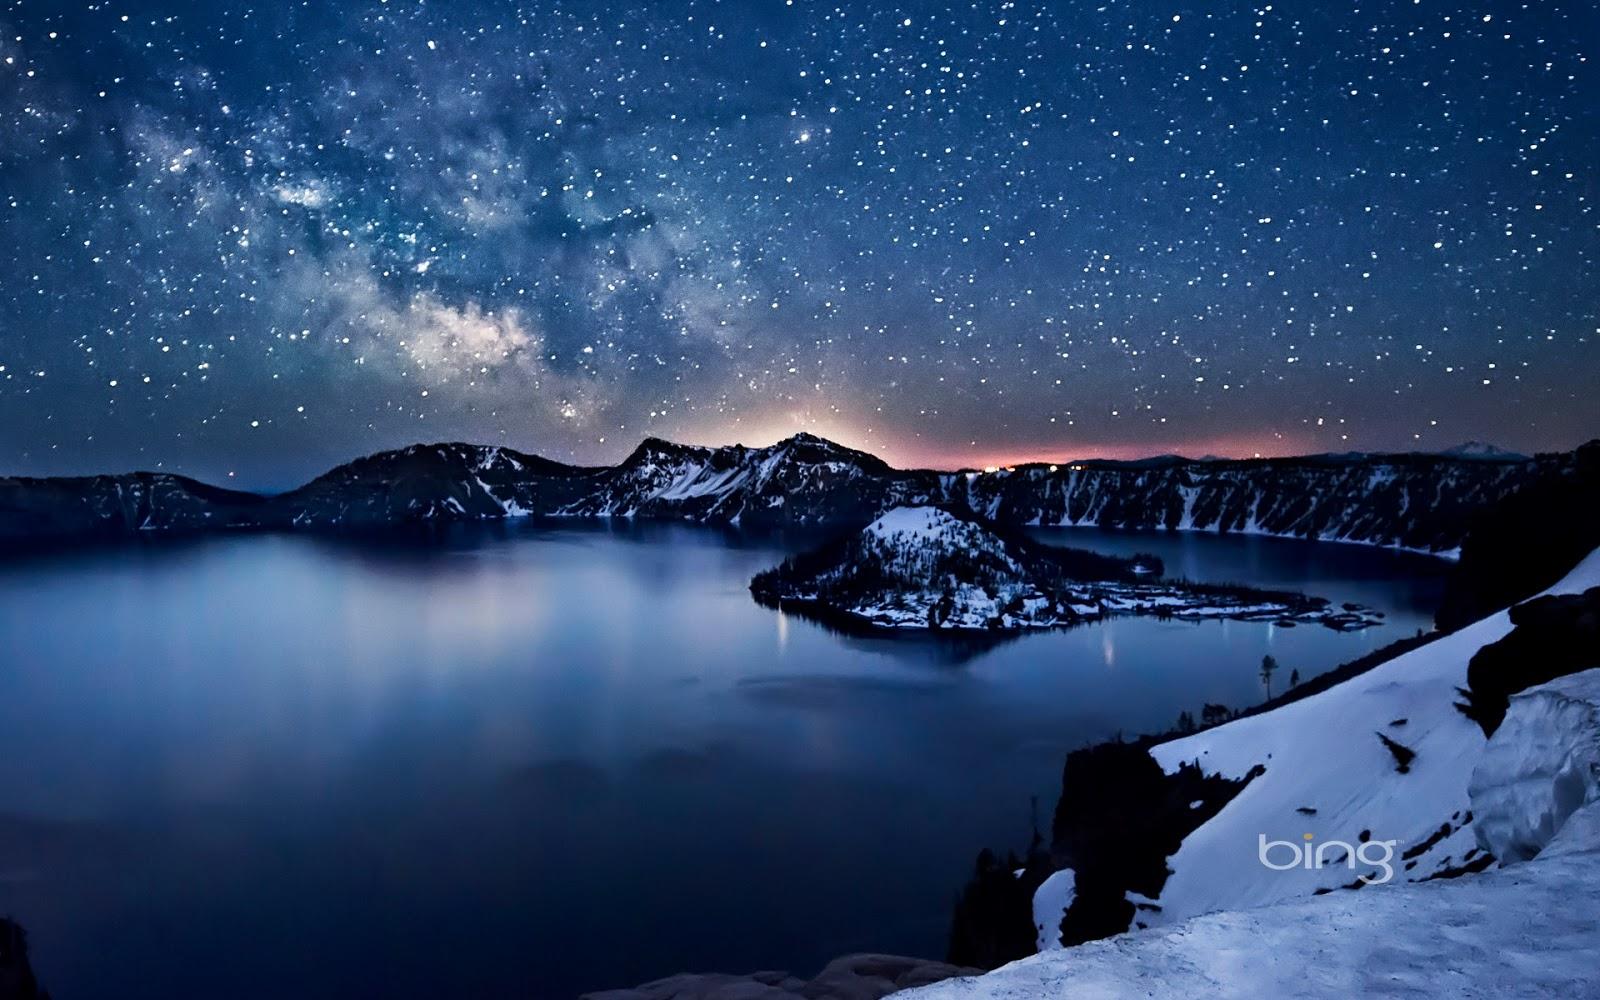 Milky Way above Crater Lake, Oregon (© Nagesh Mahadev)